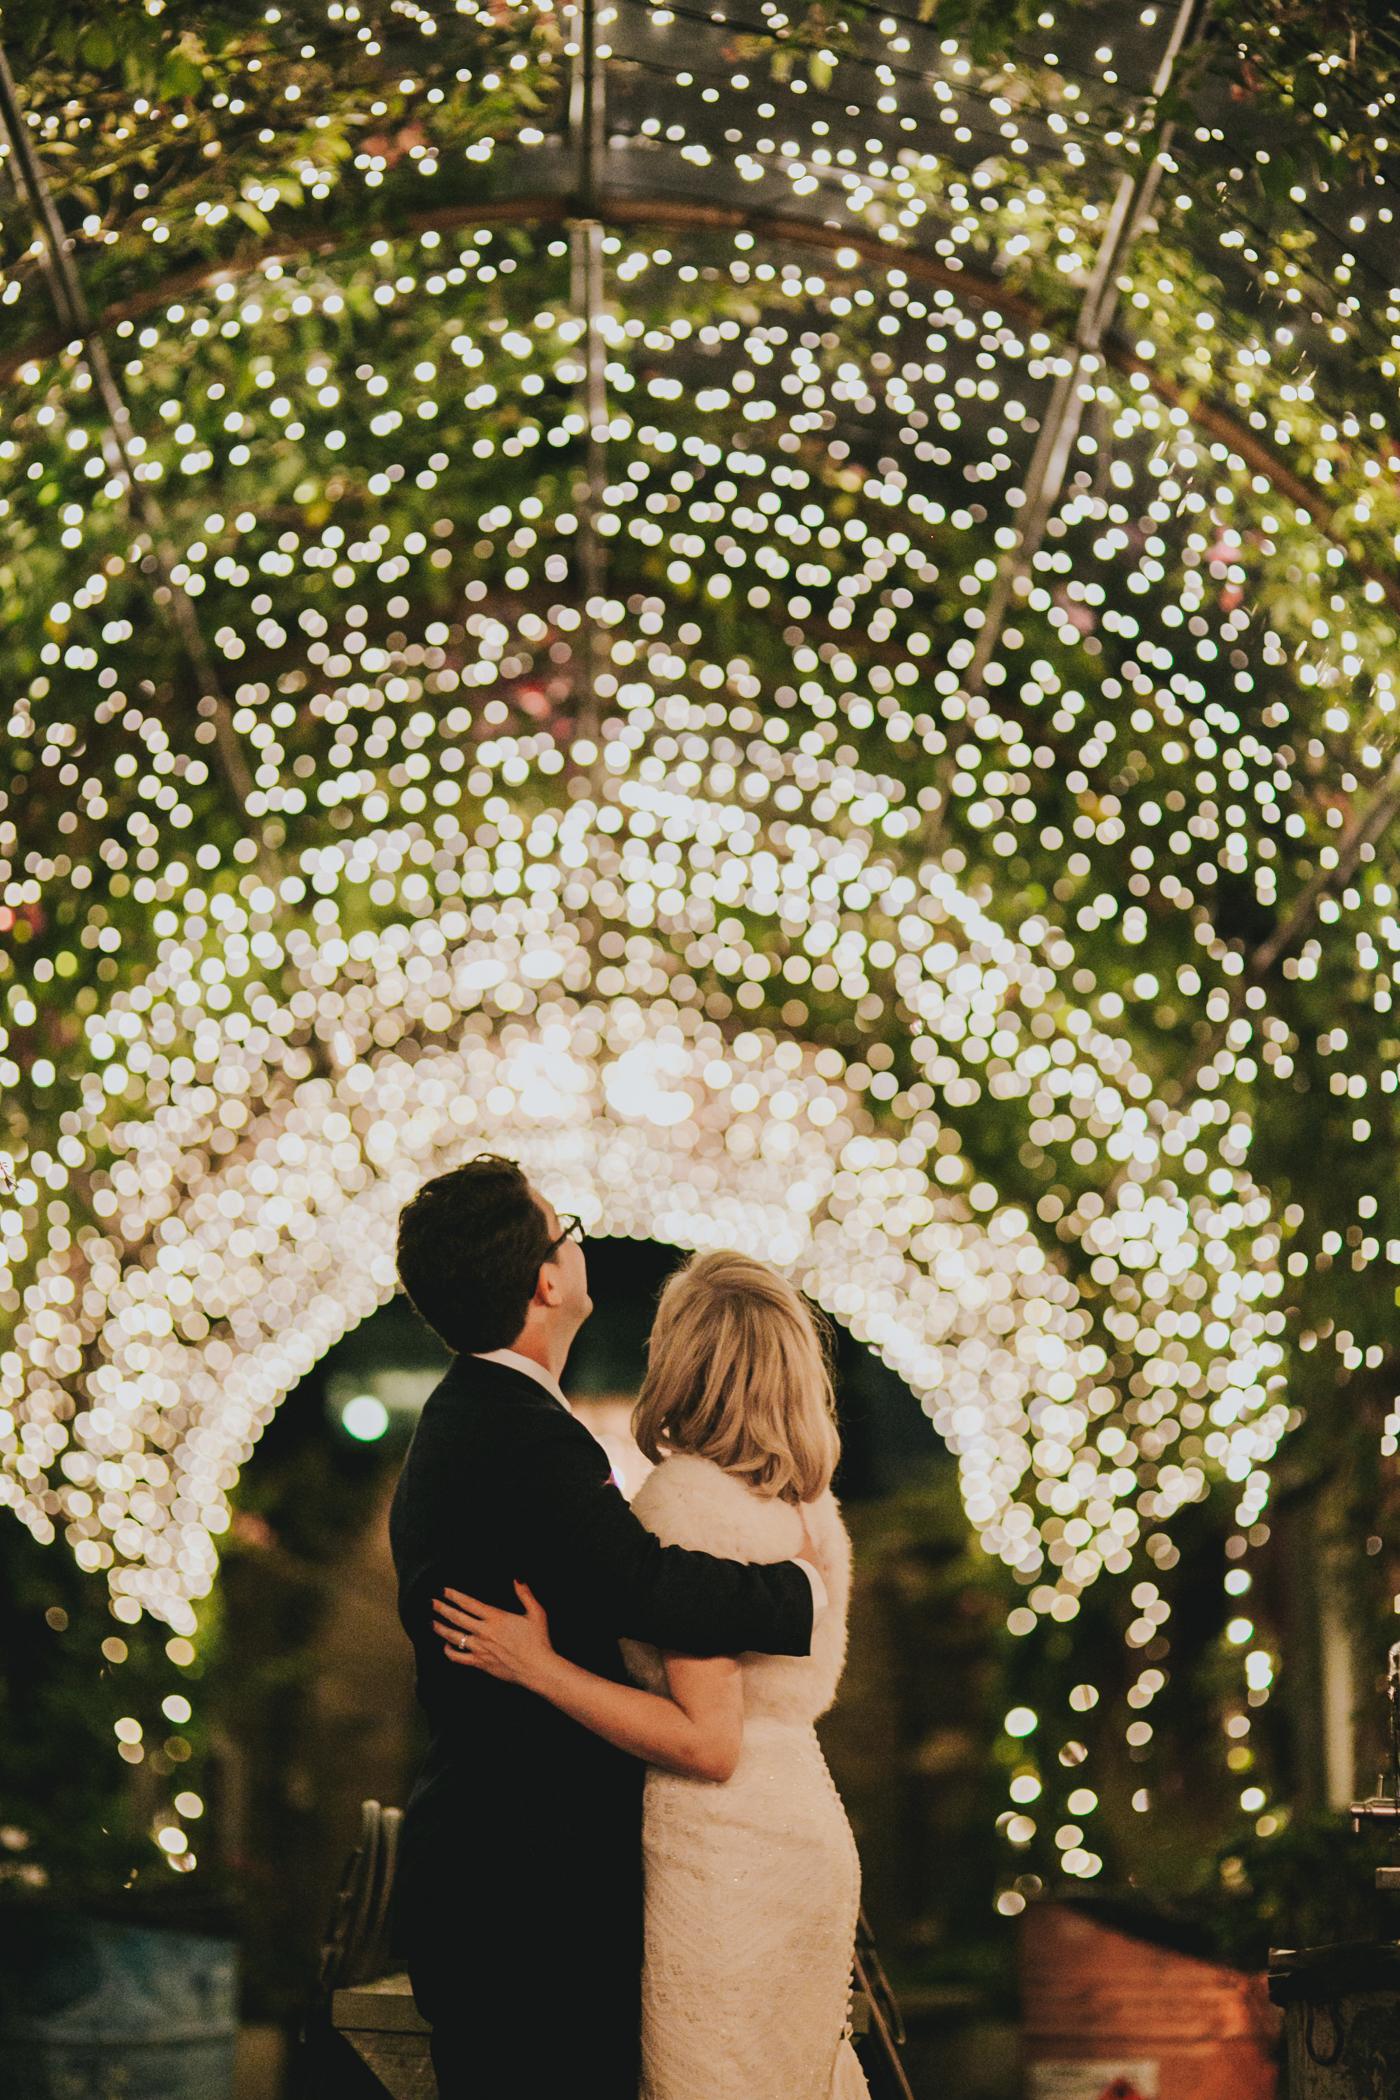 Jo & Tom Wedding - The Grounds of Alexandria - Samantha Heather Photography-336.jpg